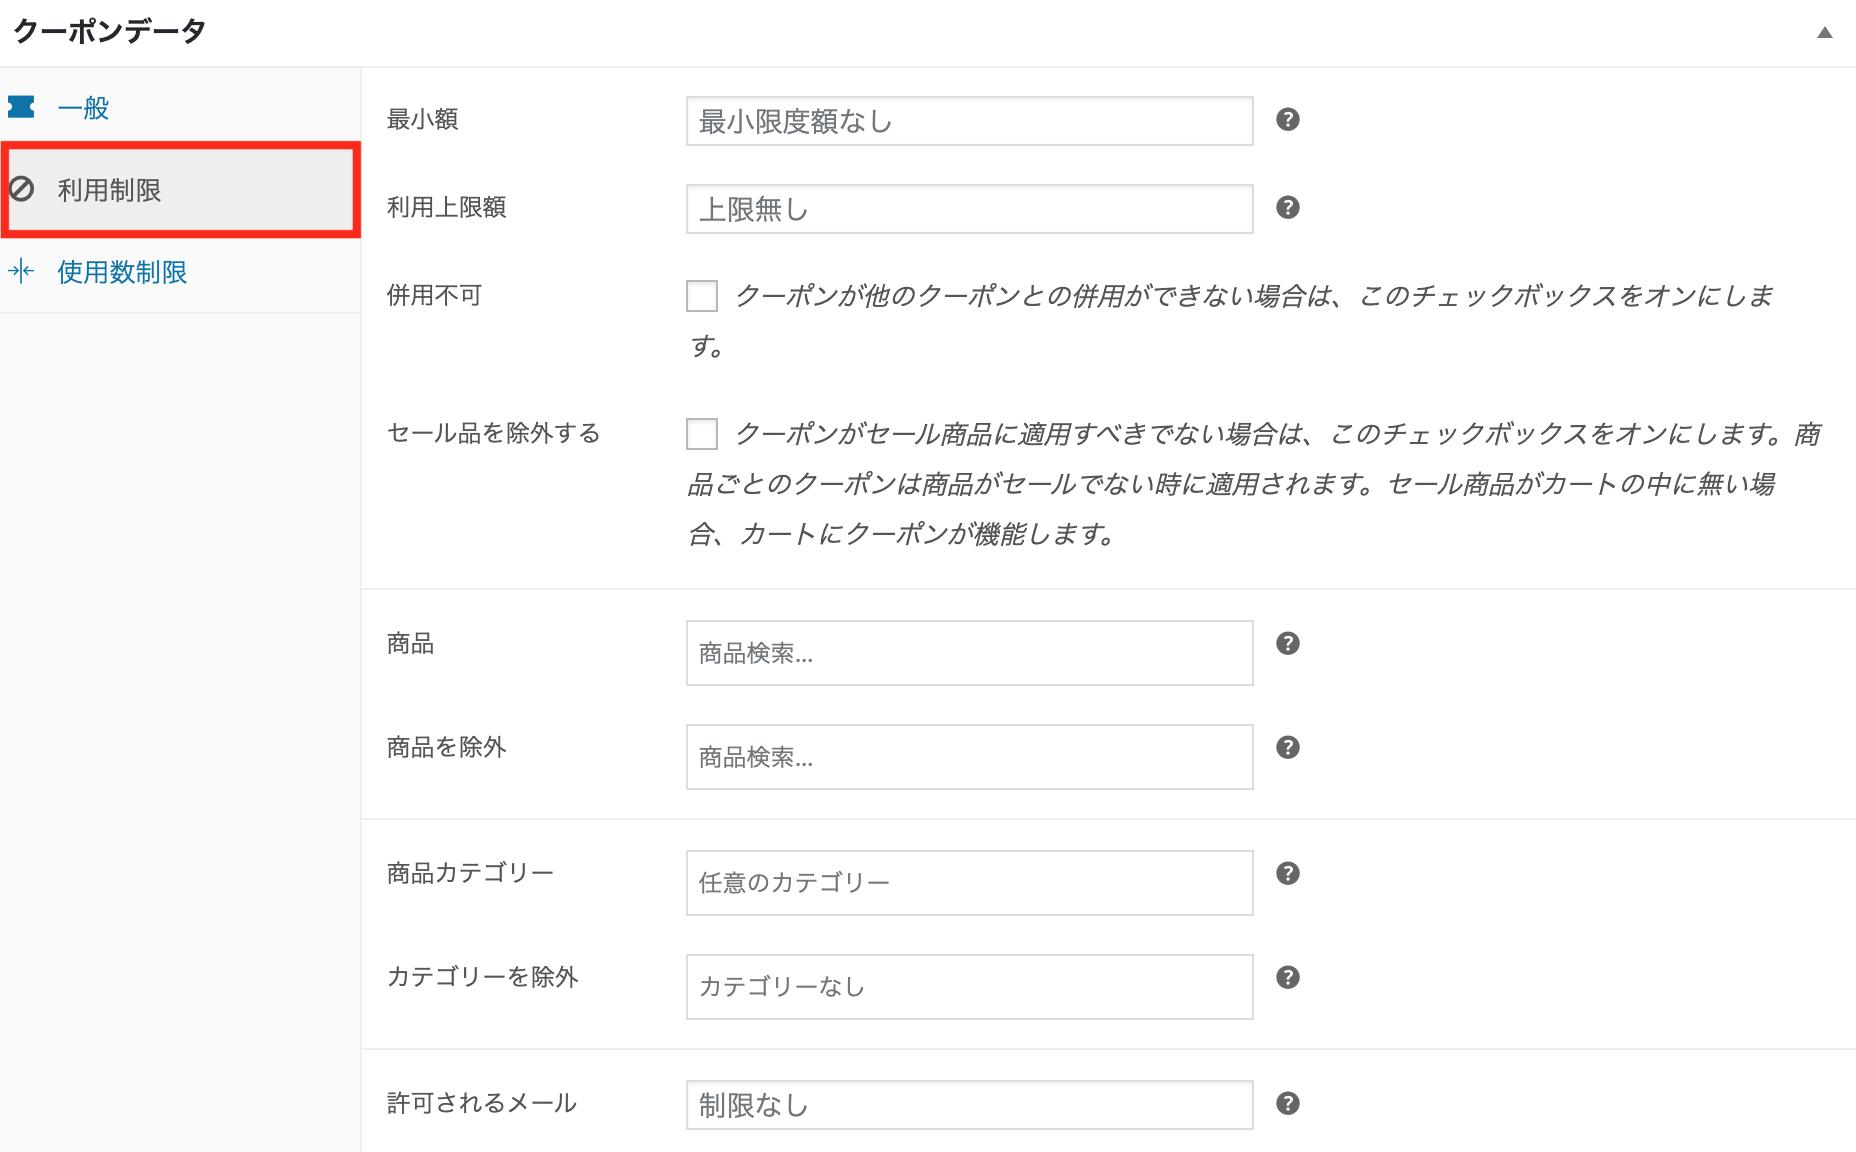 WooCommerceのクーポンデータ(利用制限)